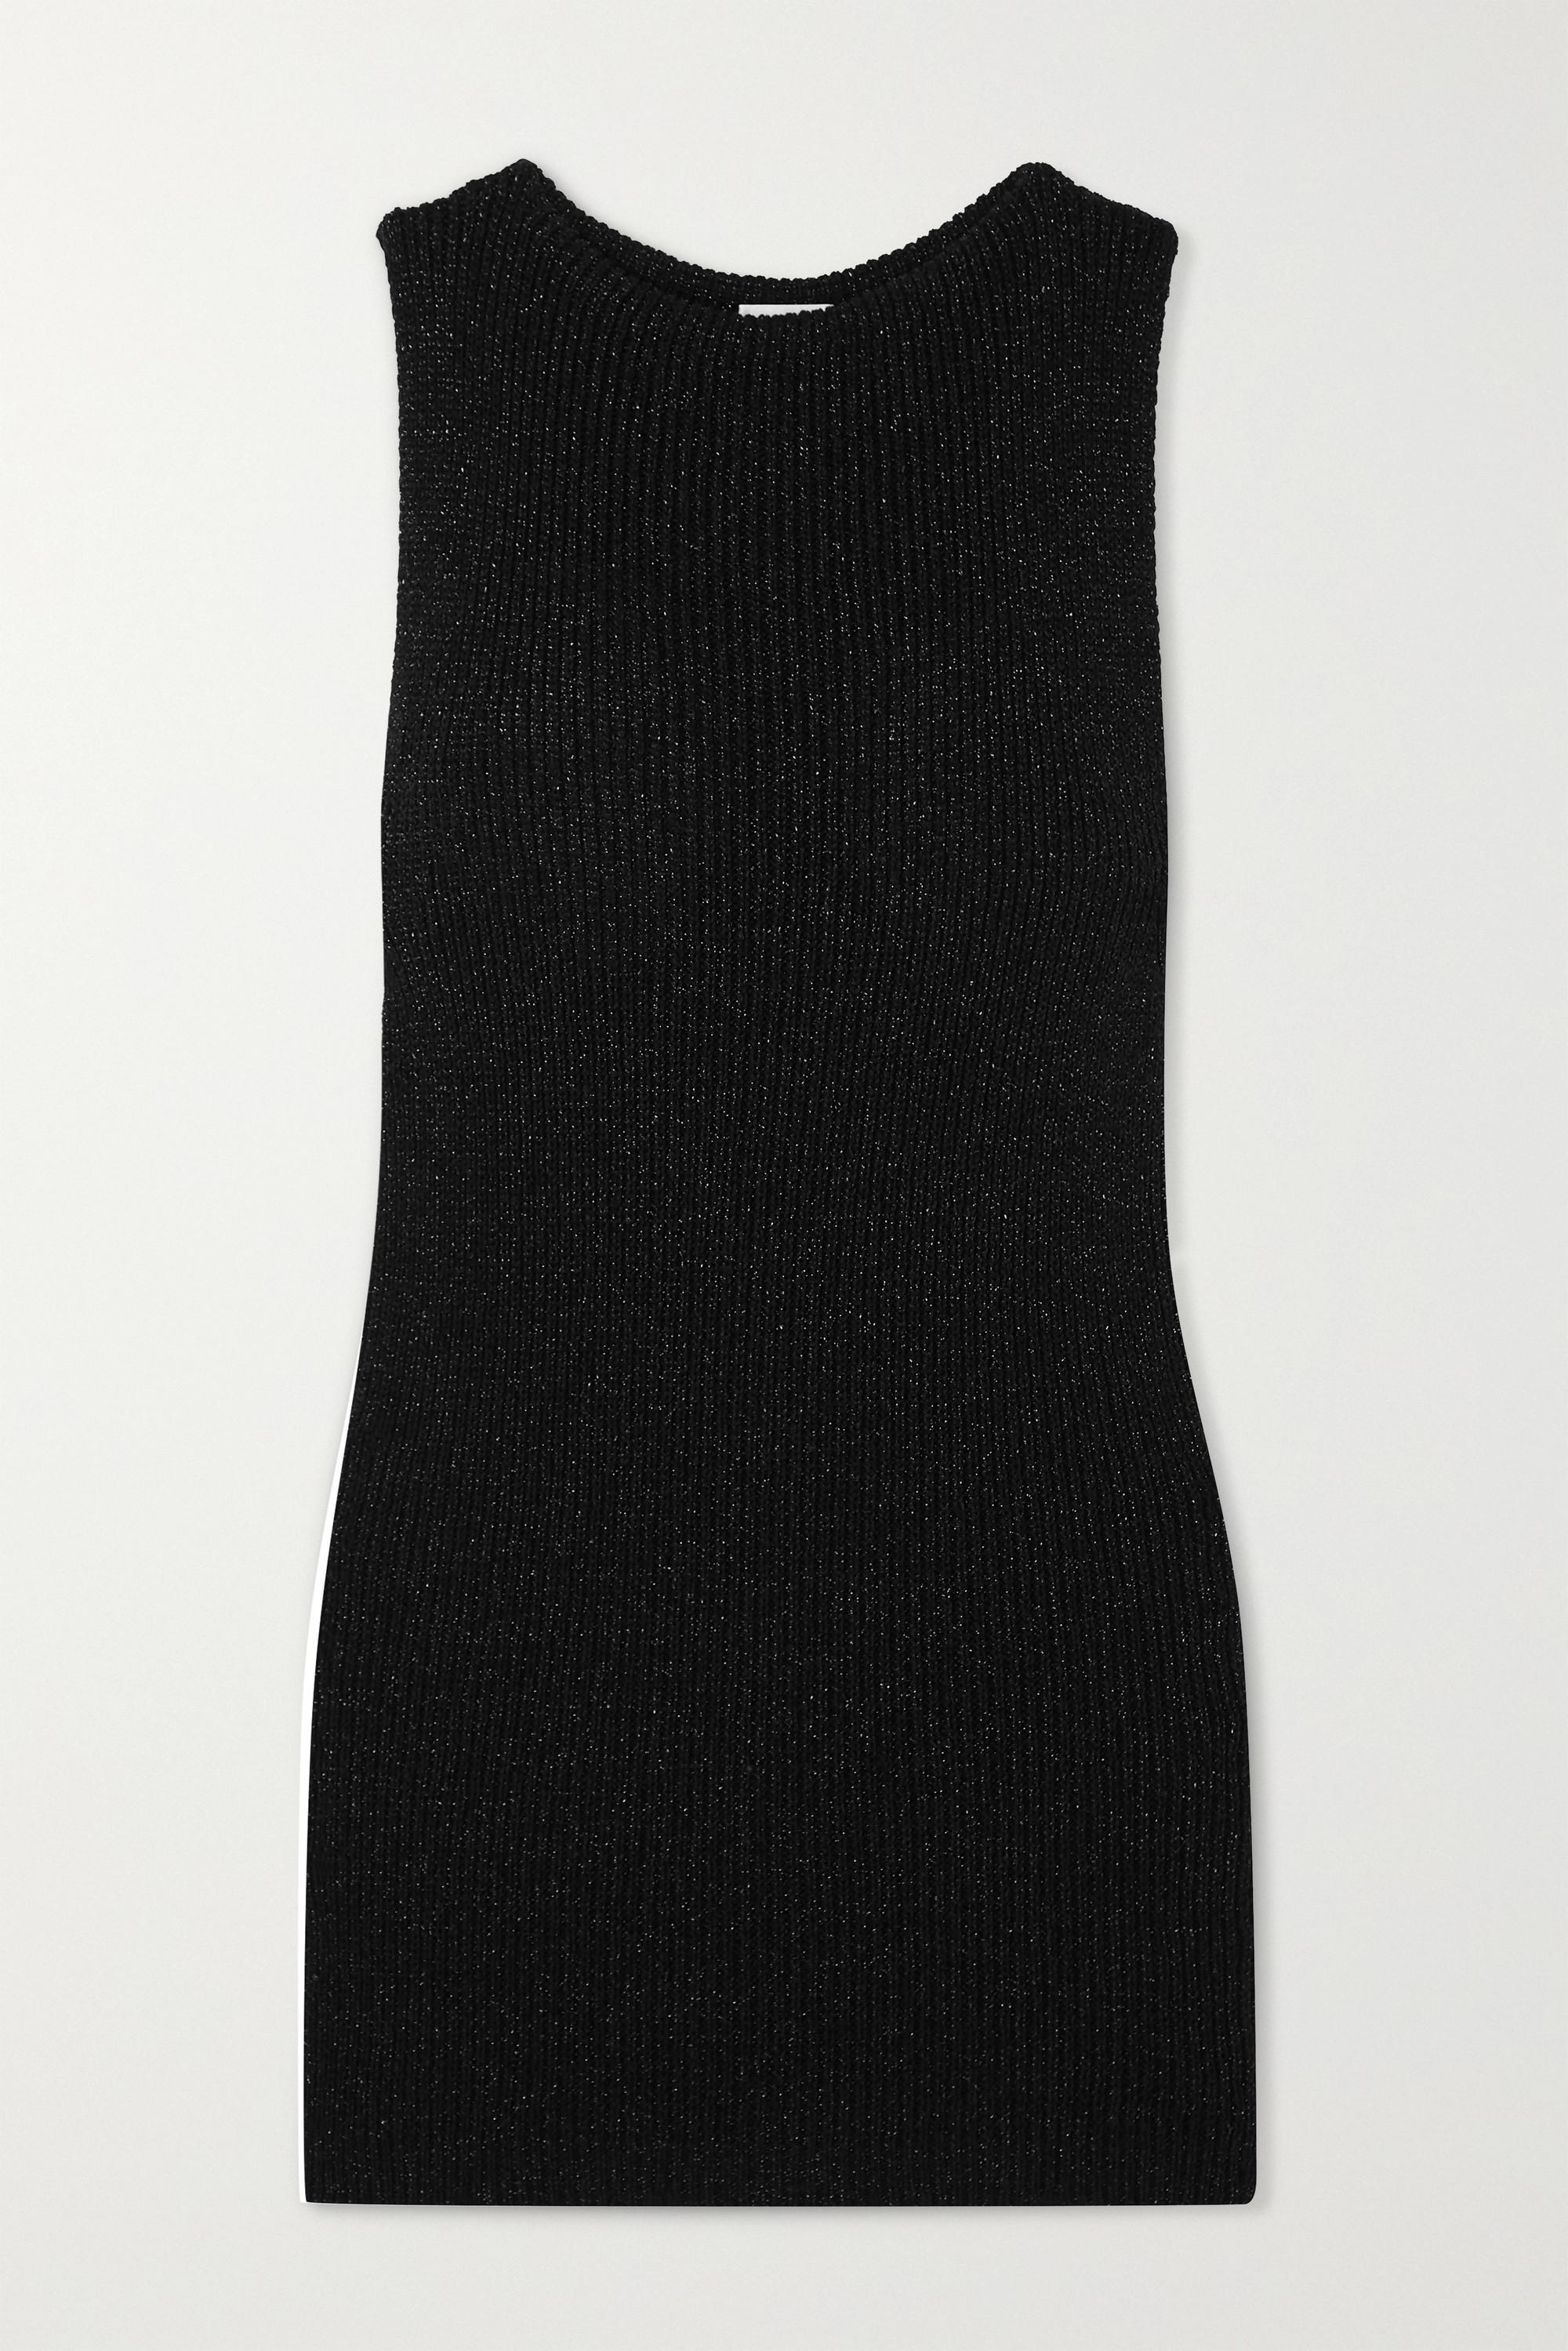 SAINT LAURENT Metallic ribbed-knit mini dress